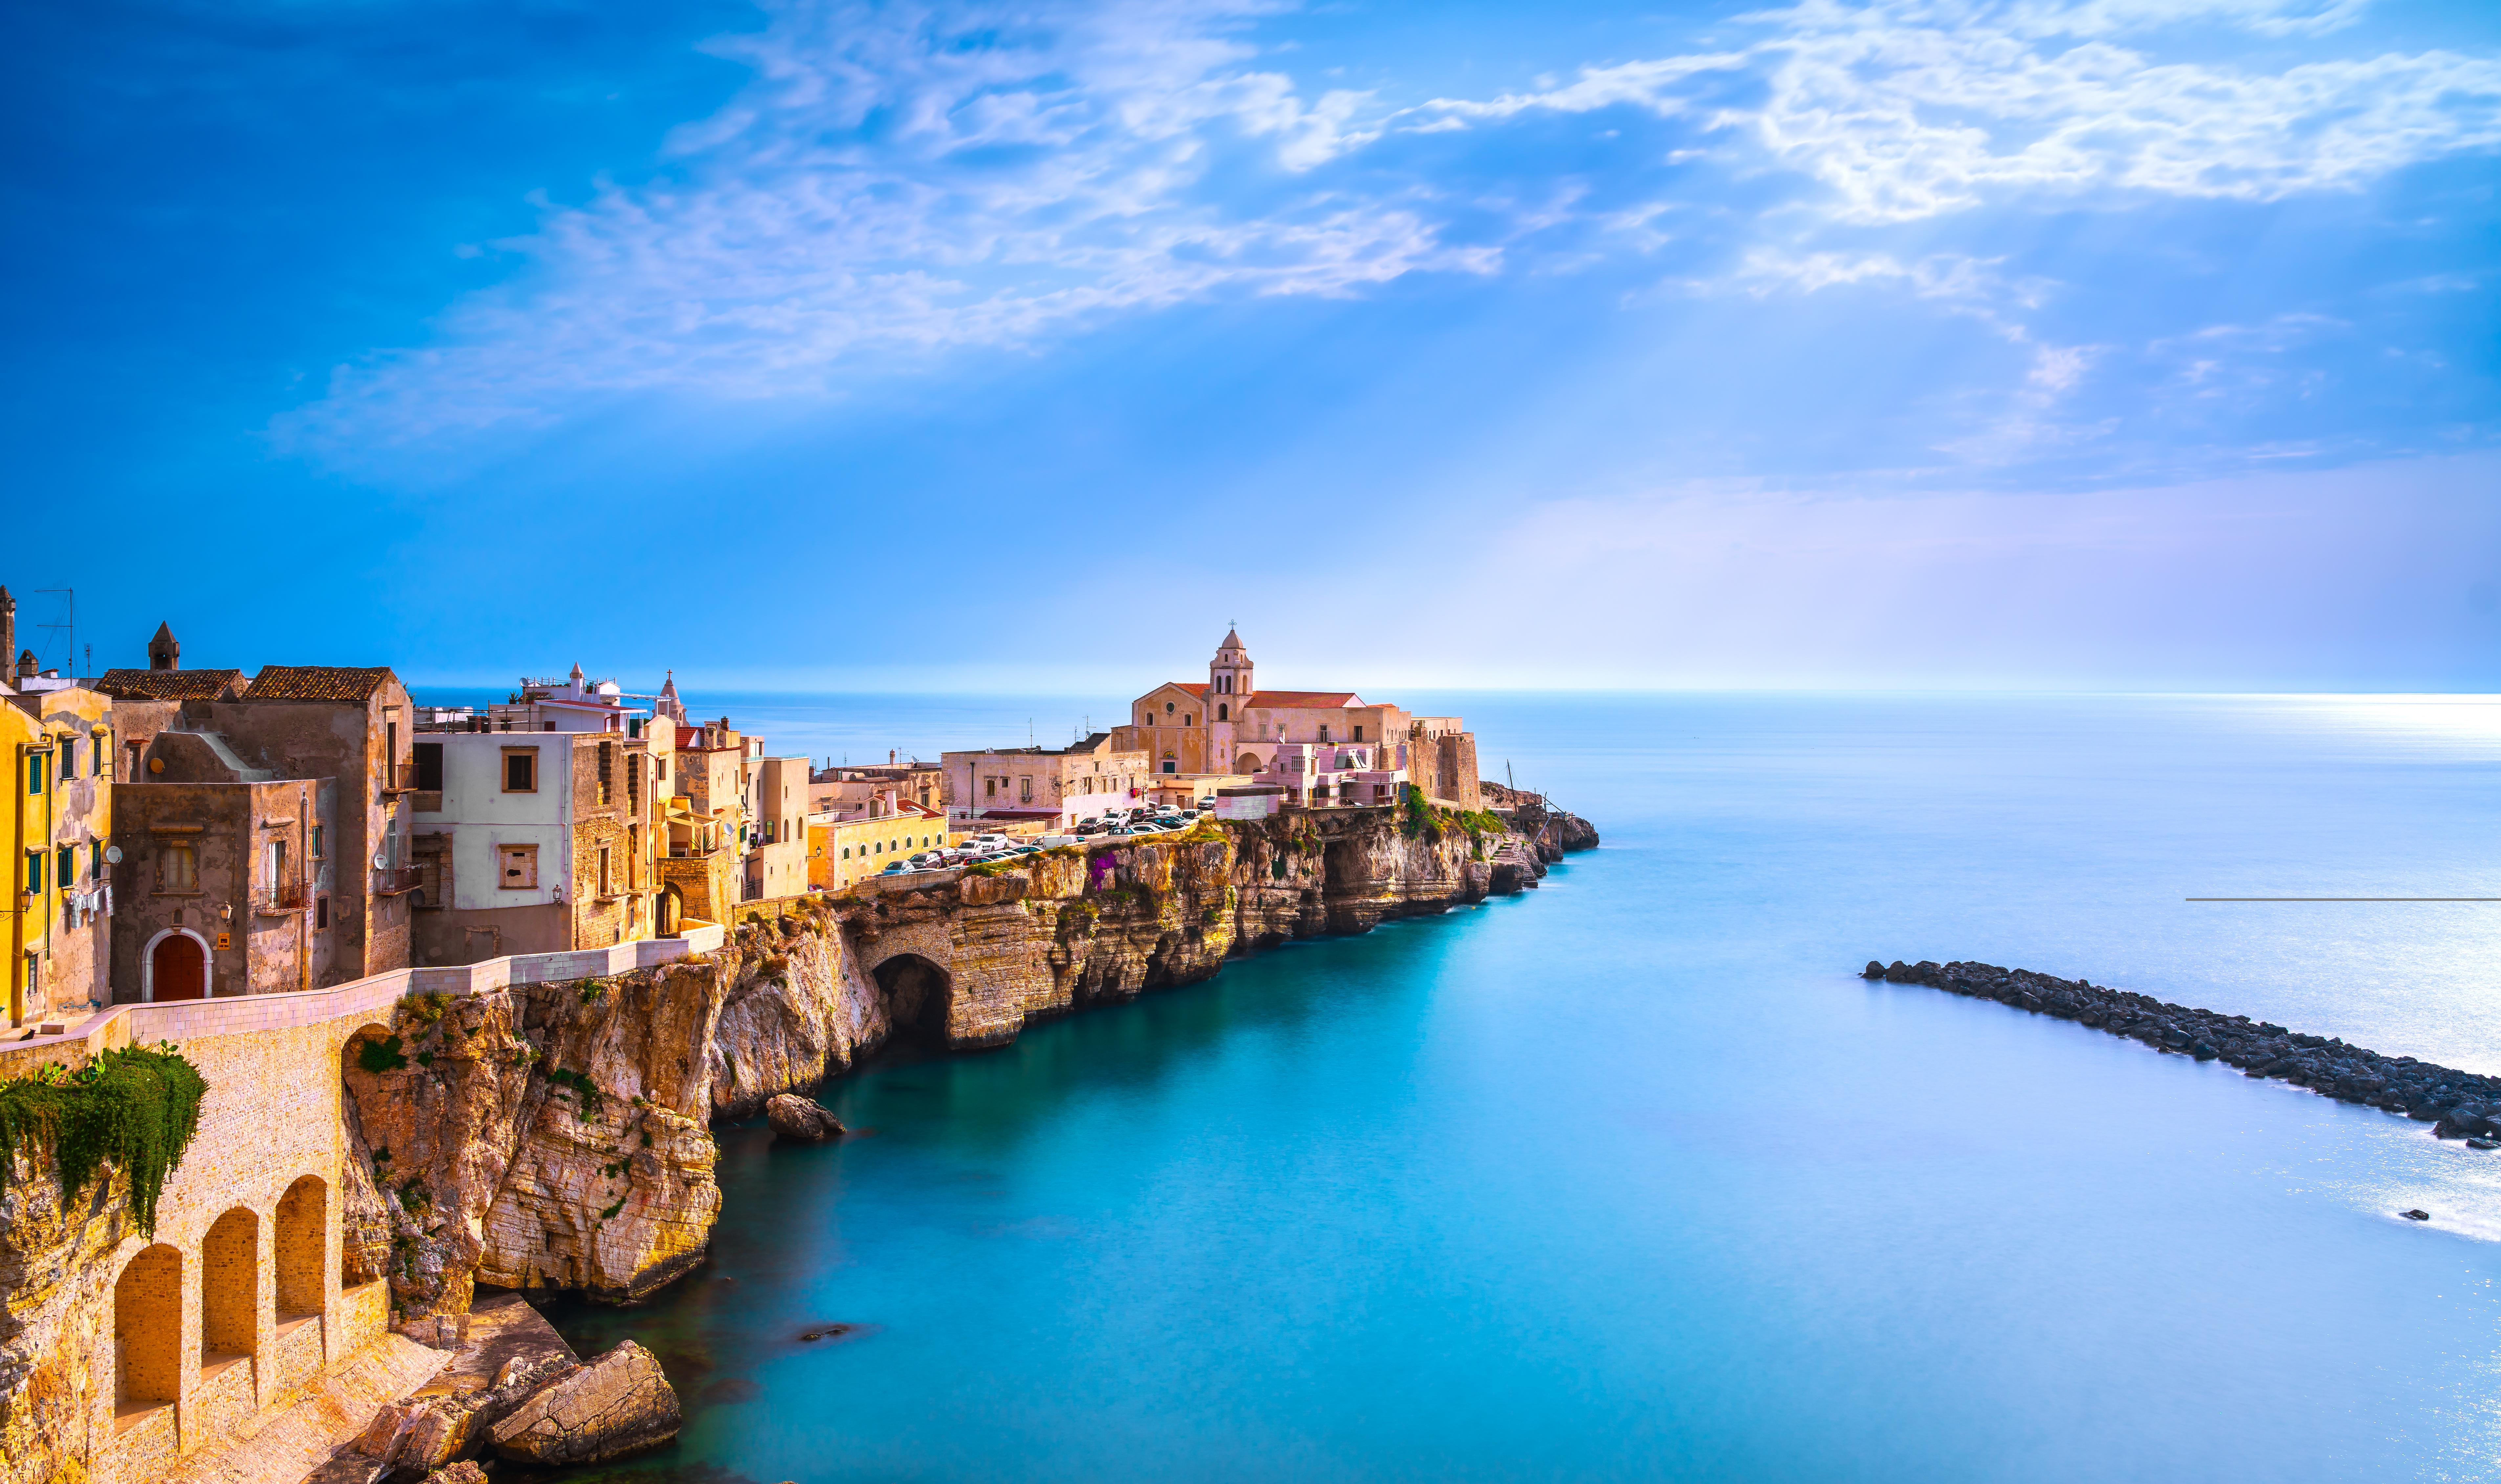 Vieste, one of the destinations in Riviera Travel's Puglia, Lecce & Vieste – Undiscovered Italy itinerary